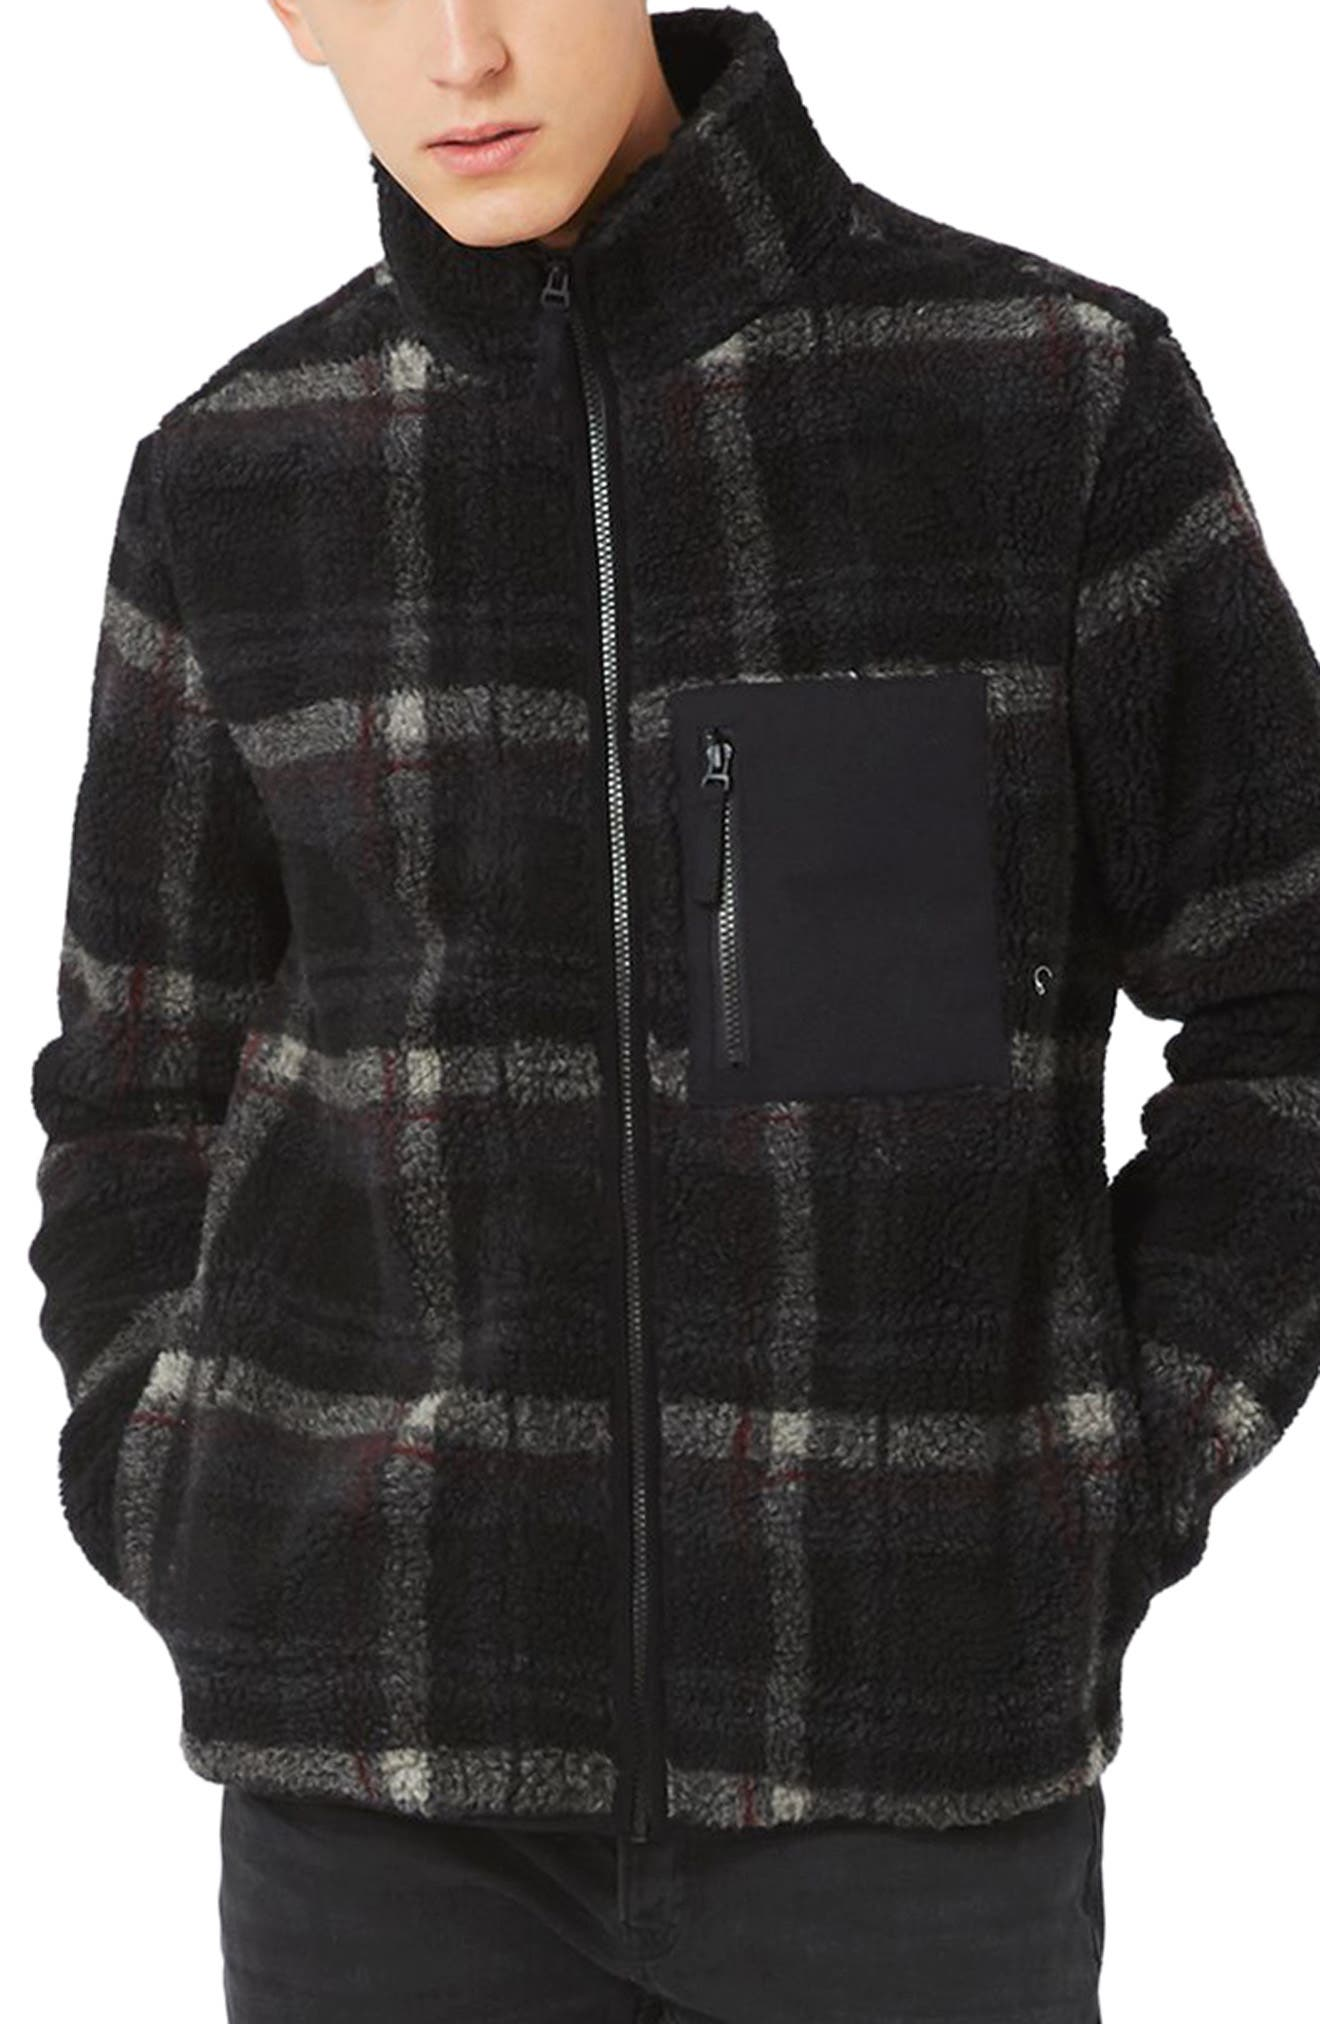 Main Image - Topman Check Borg Zip Front Jacket